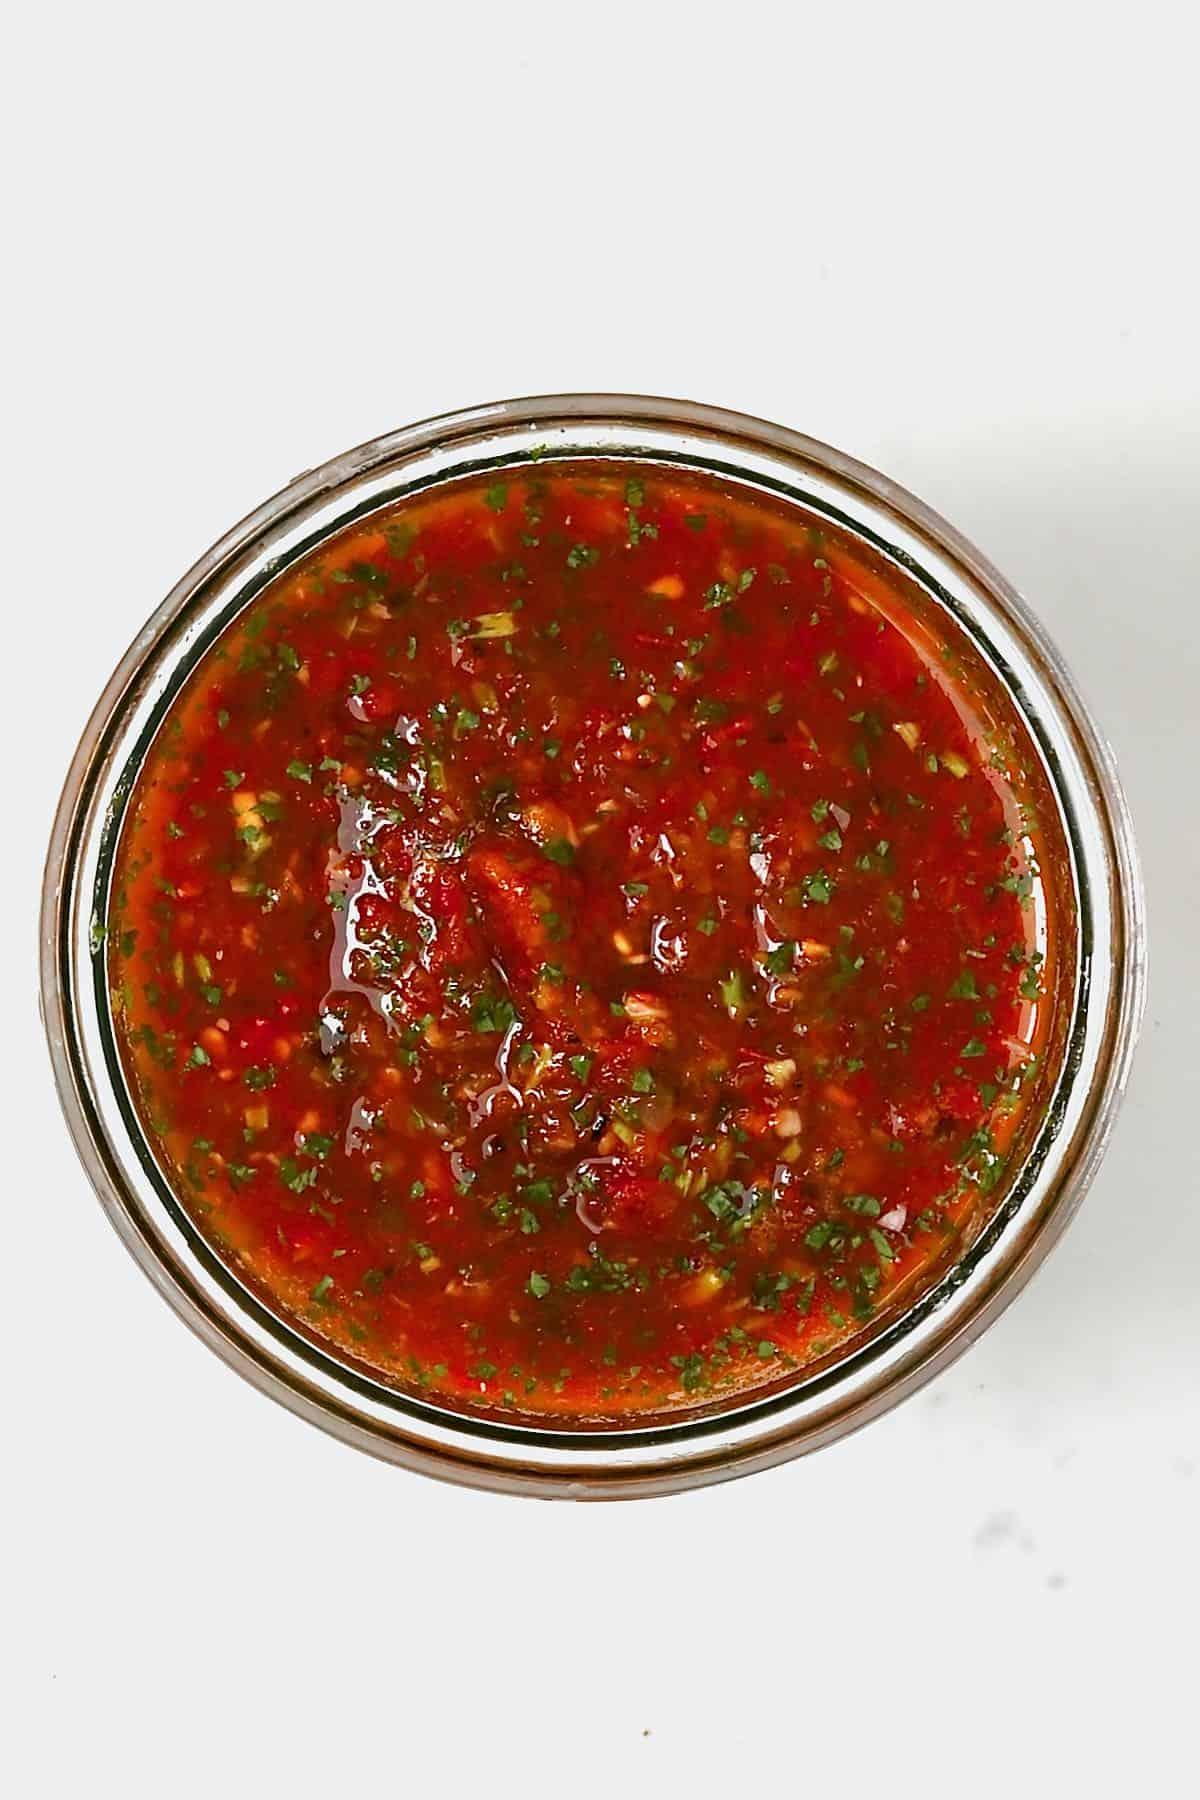 A jar with roasted tomato salsa